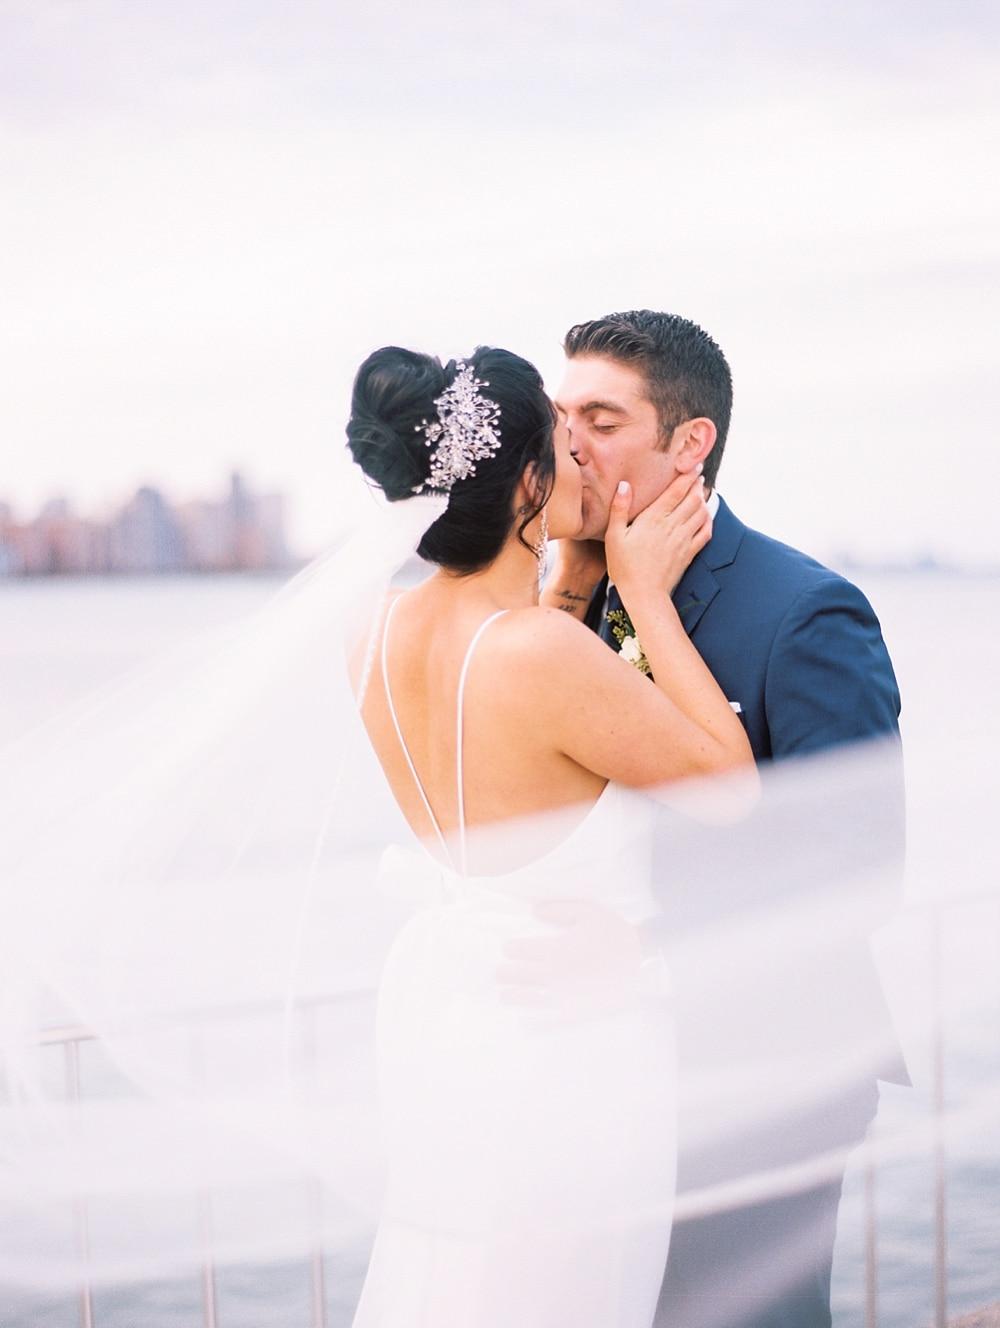 Kristin-La-Voie-Photography-chicago-wedding-photographer-19